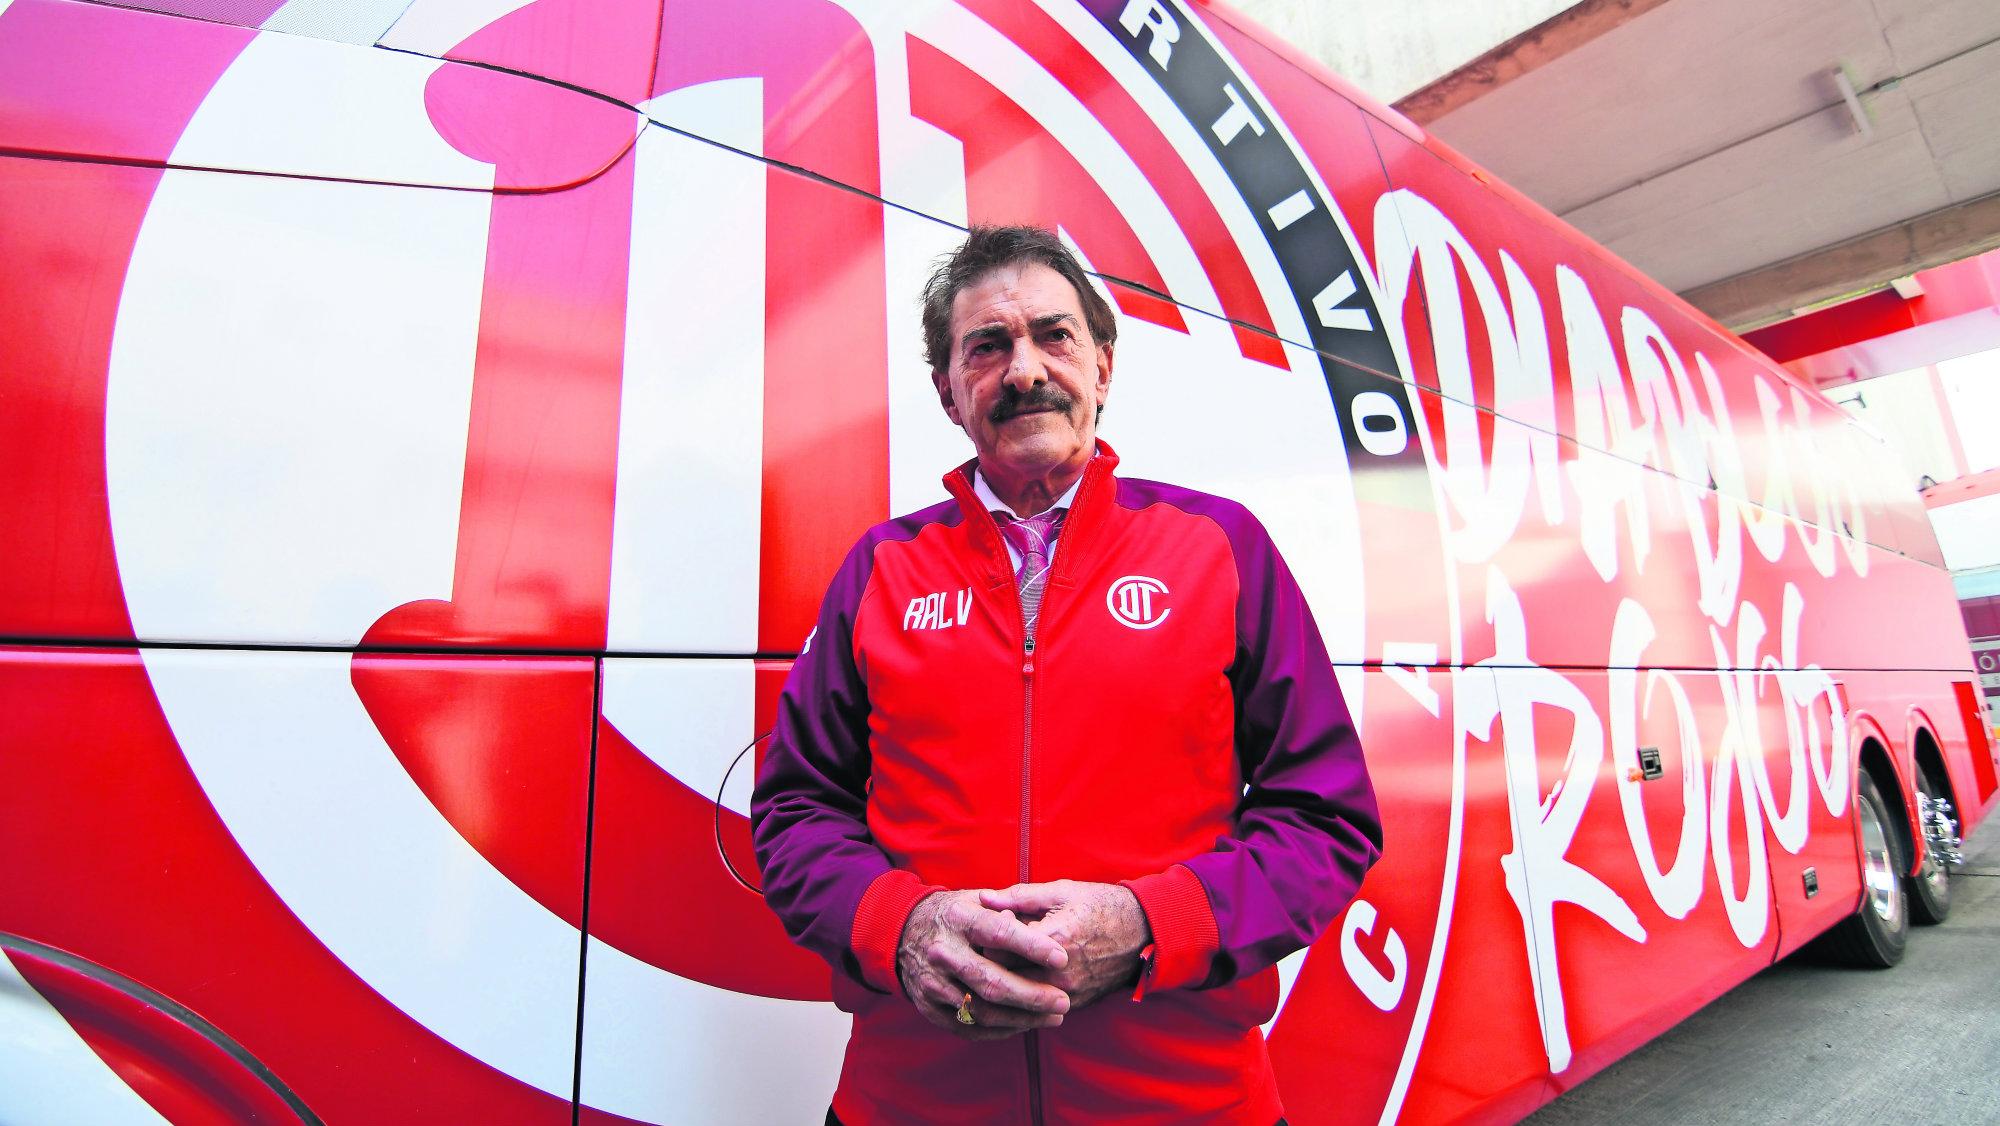 Ricardo La Volpe regresa Toluca mensaje